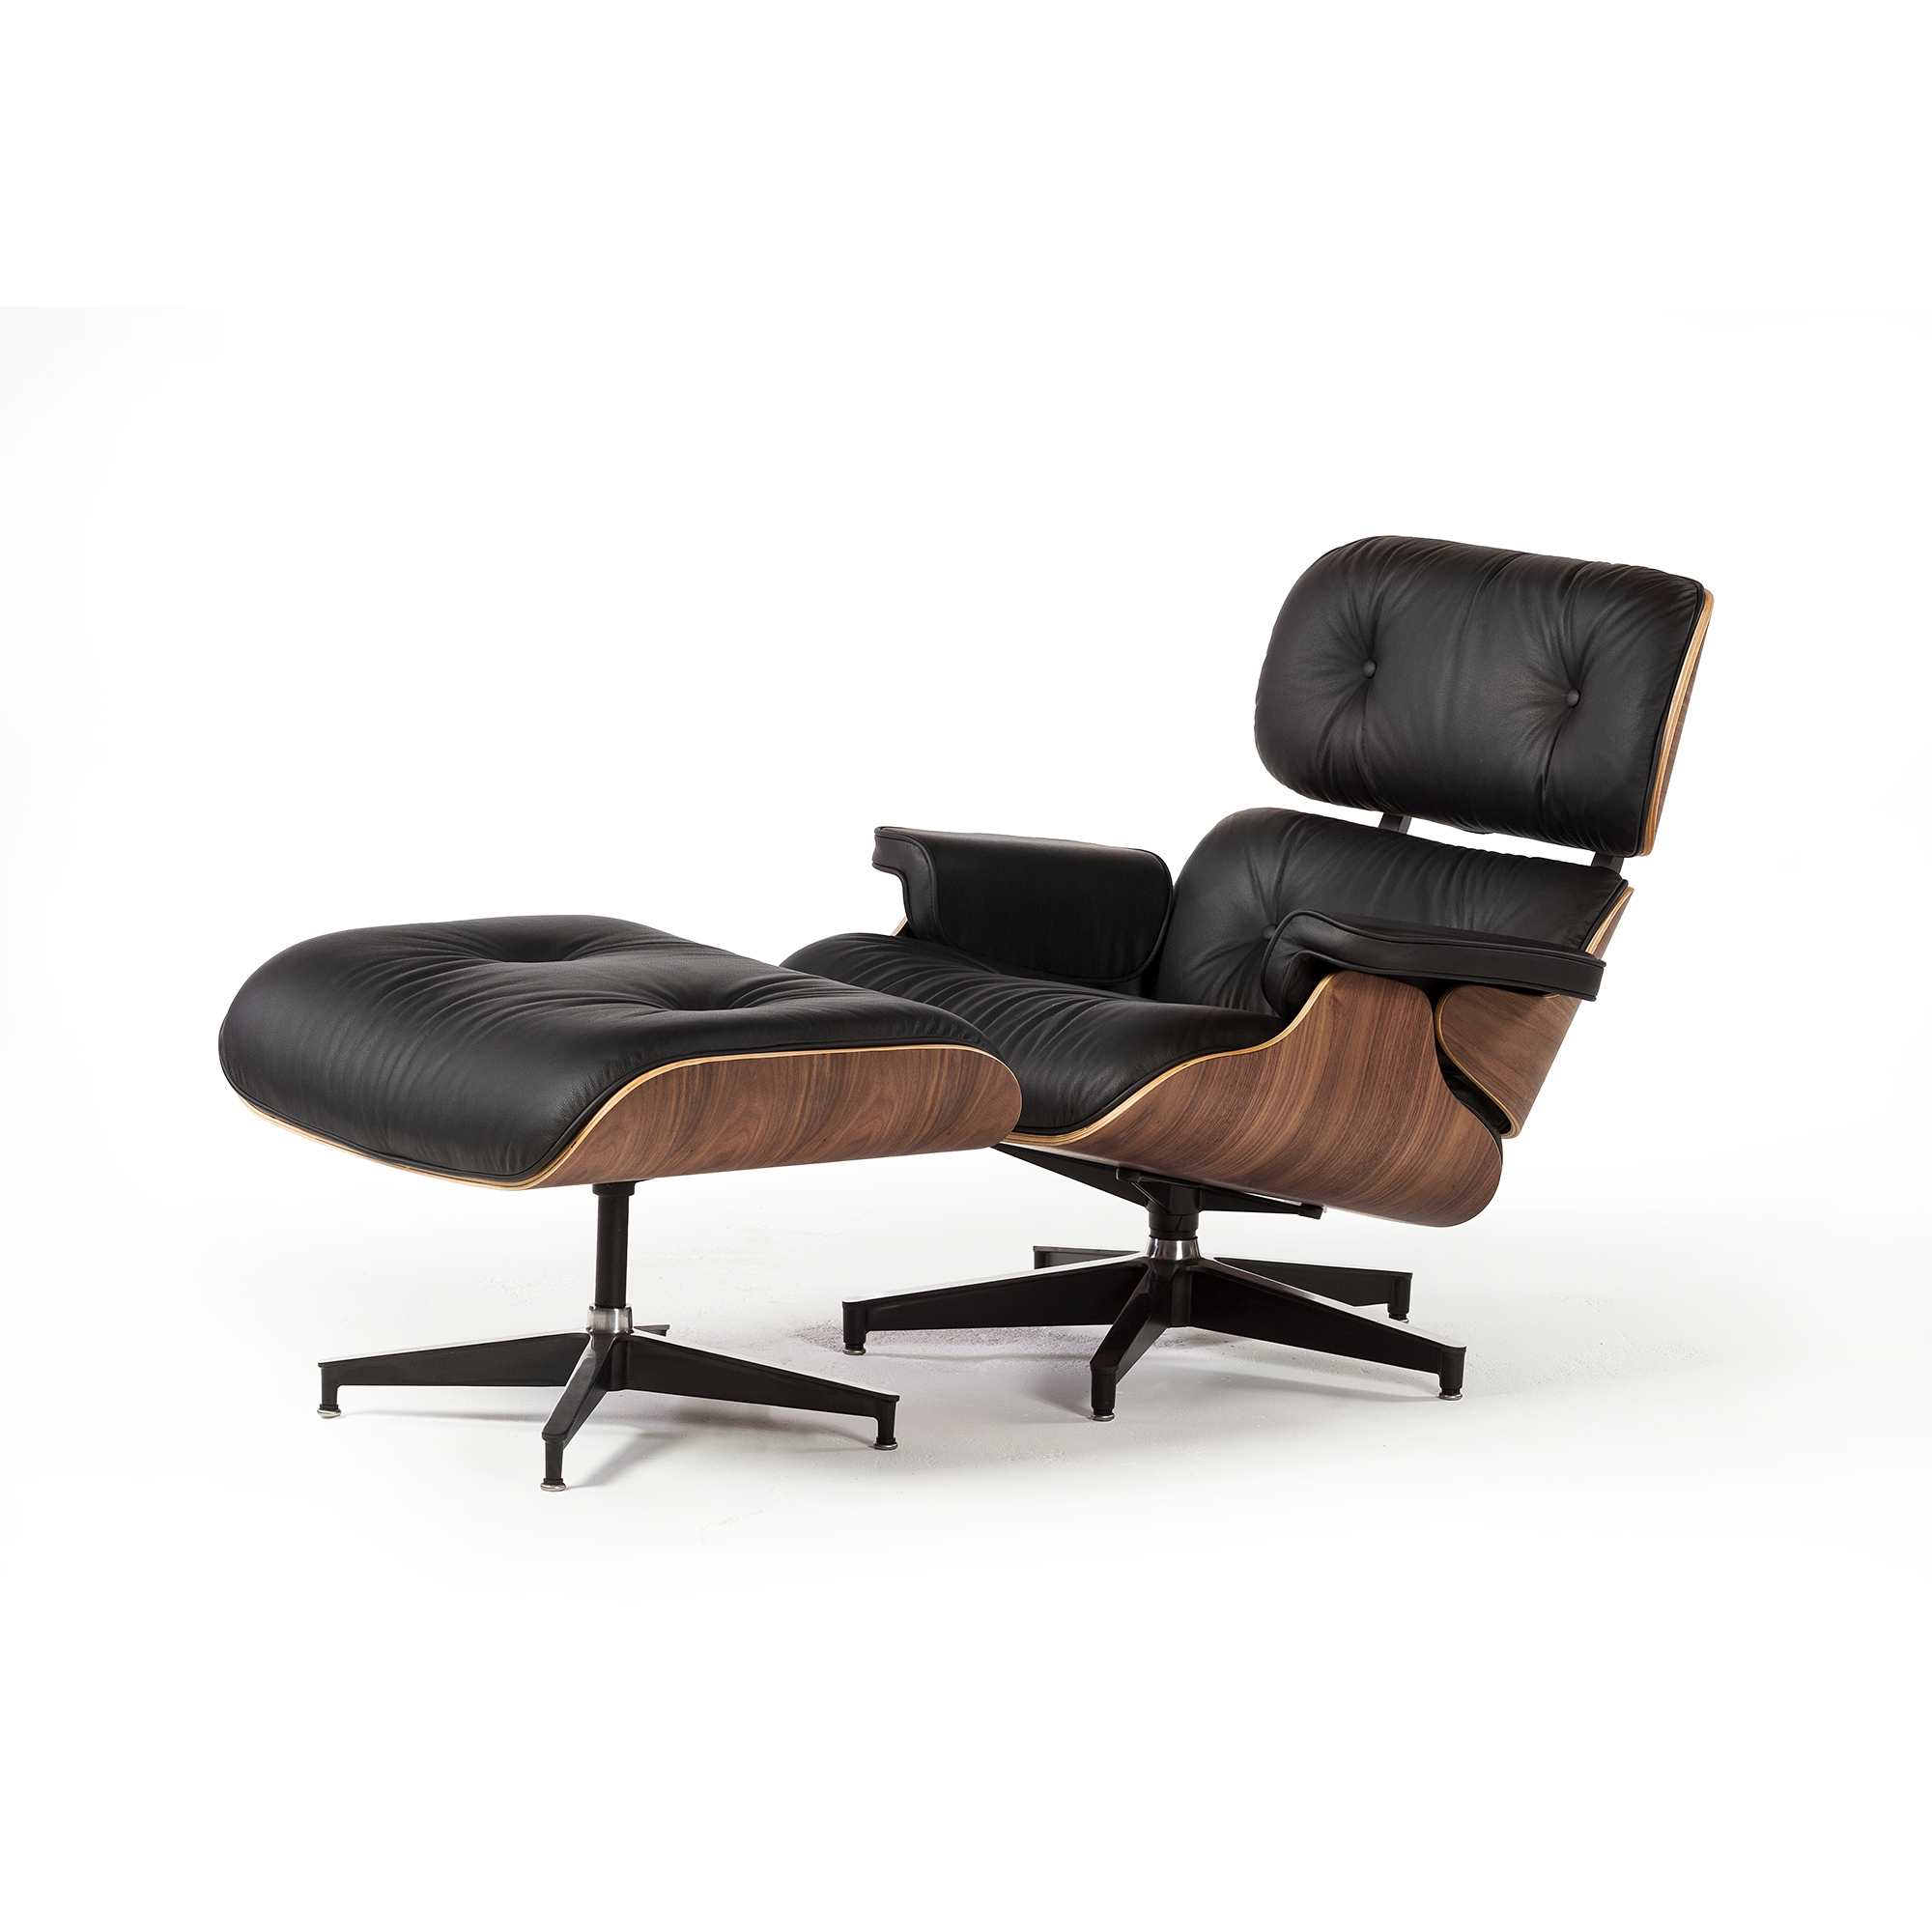 Stupendous Mid Century Style Lounge Chair And Ottoman Machost Co Dining Chair Design Ideas Machostcouk